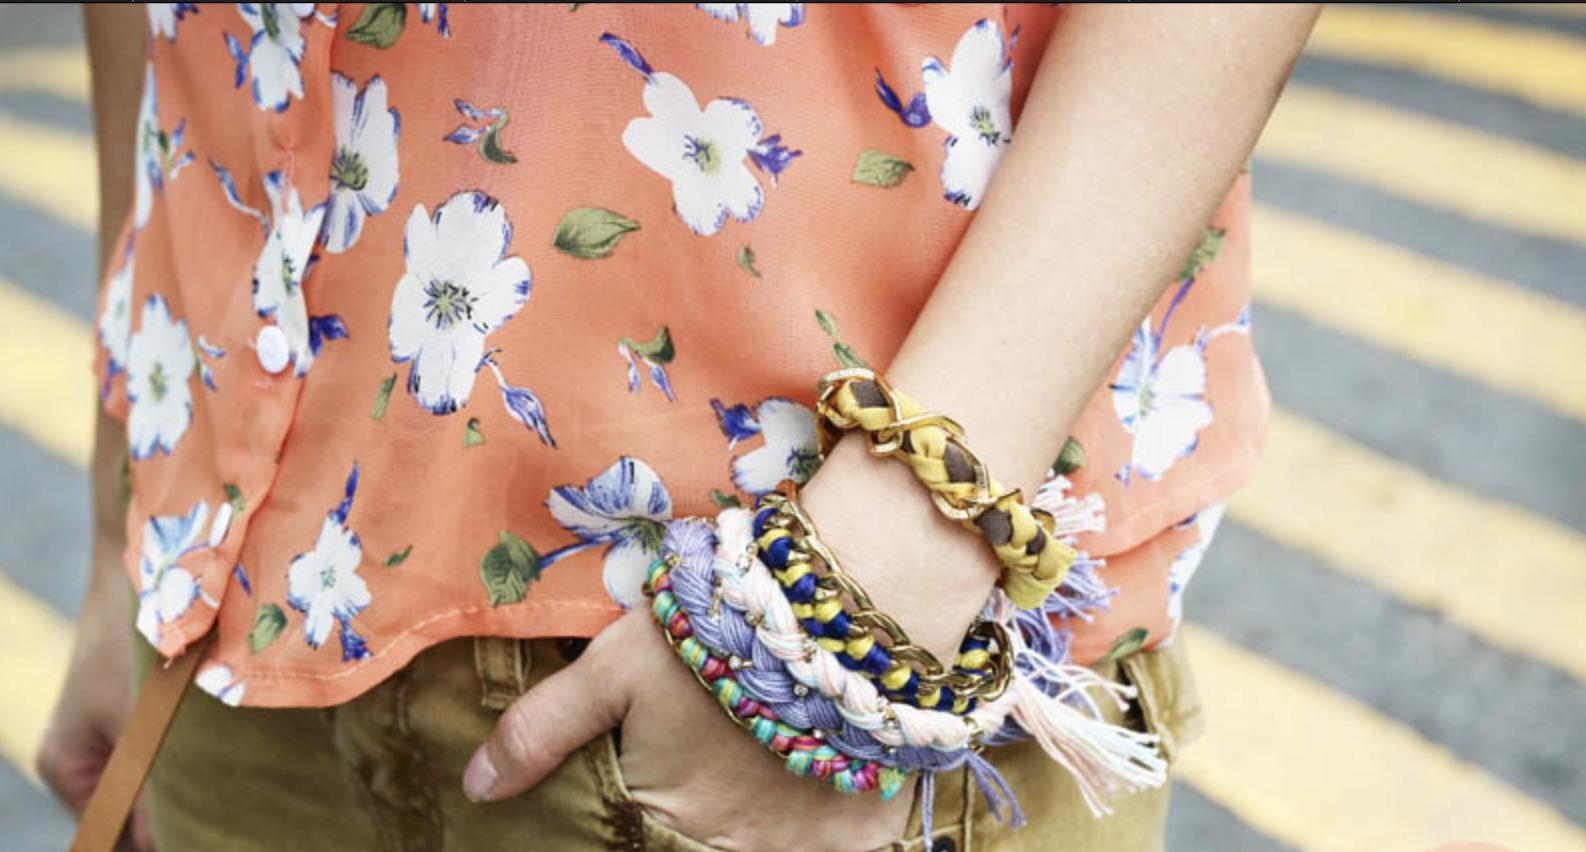 Make the Friendship Bracelets a Part of Your Attire